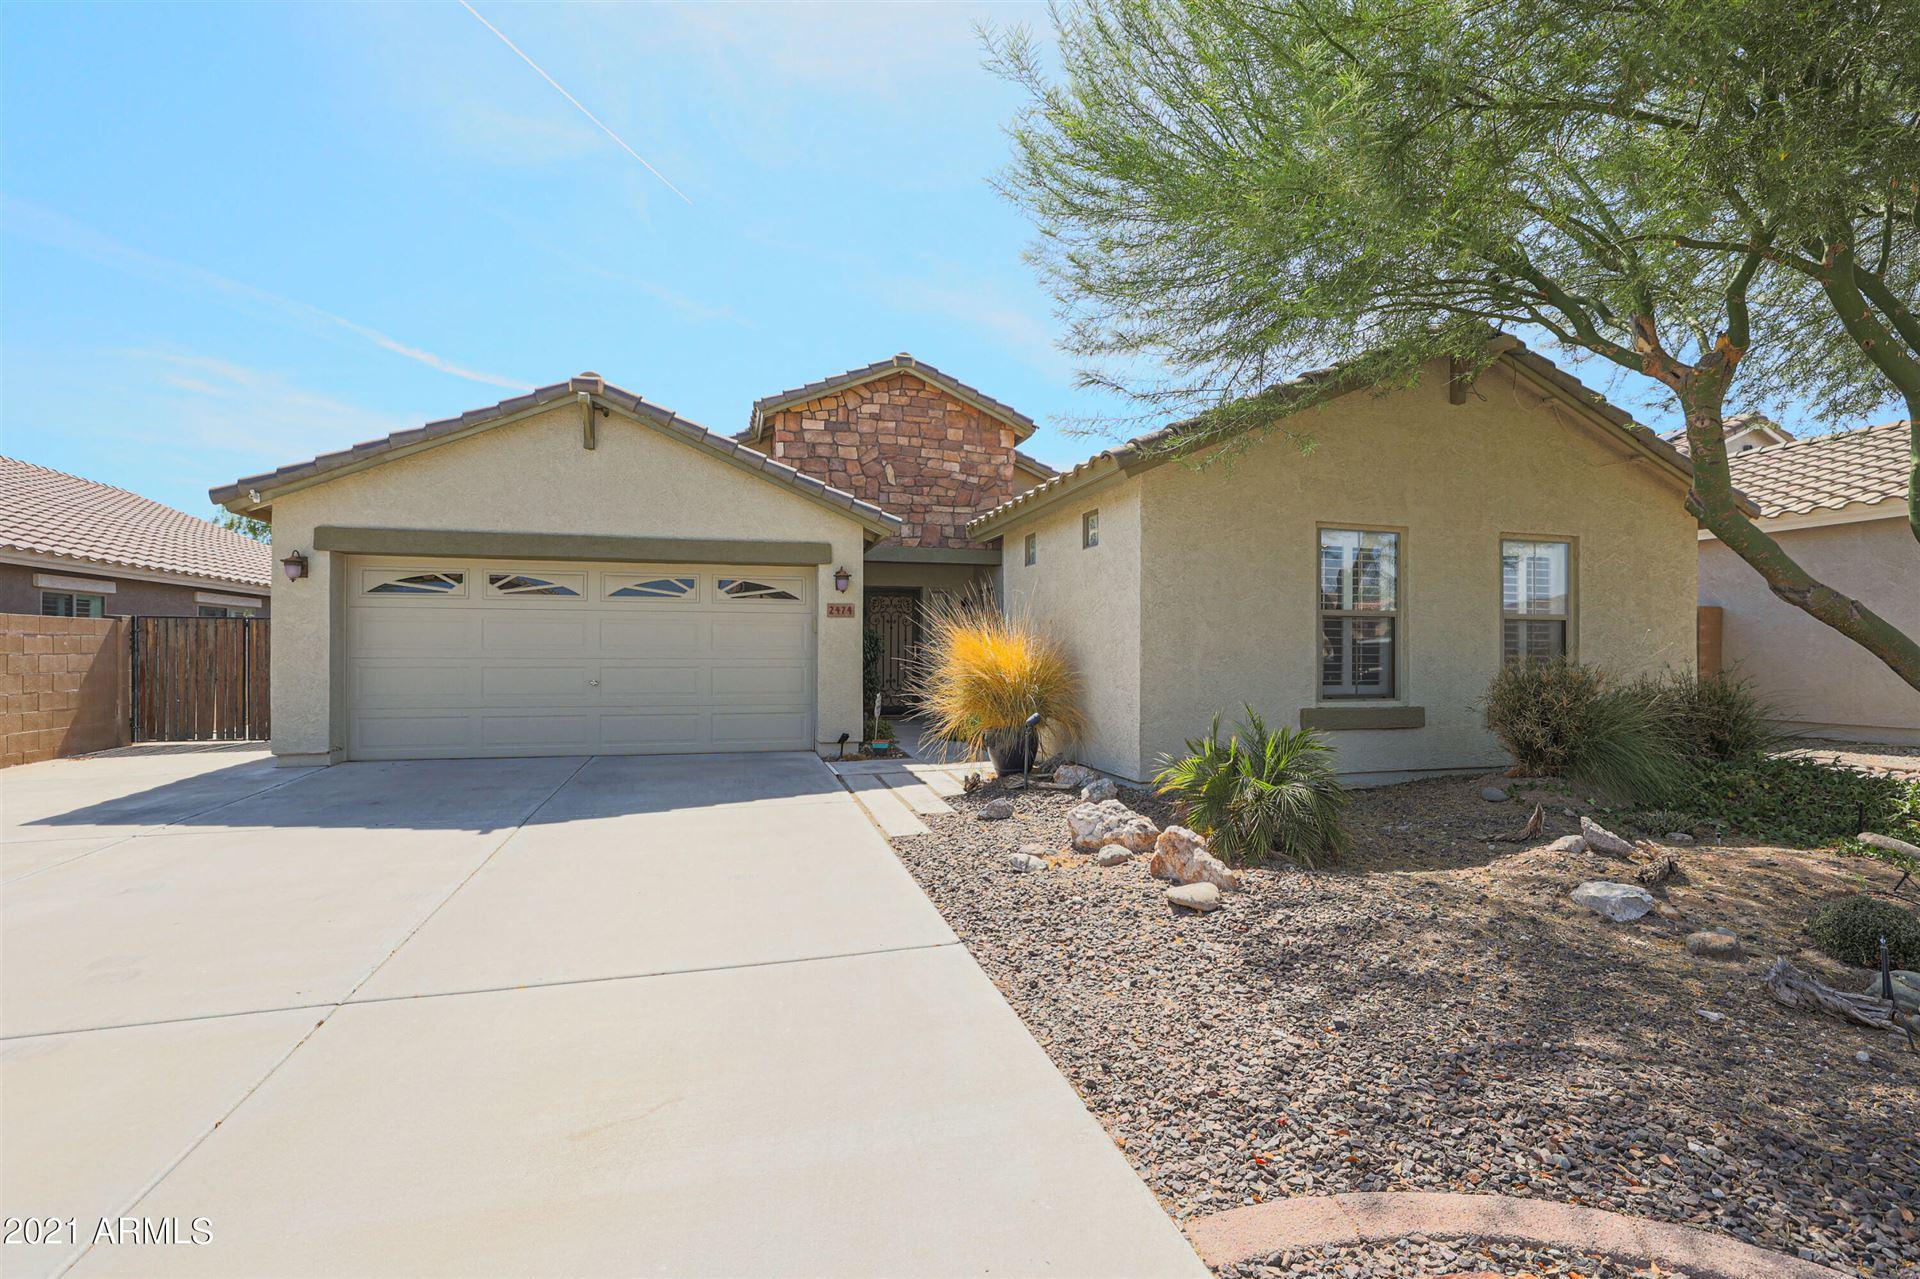 Photo of 2474 S 257TH Avenue, Buckeye, AZ 85326 (MLS # 6268229)